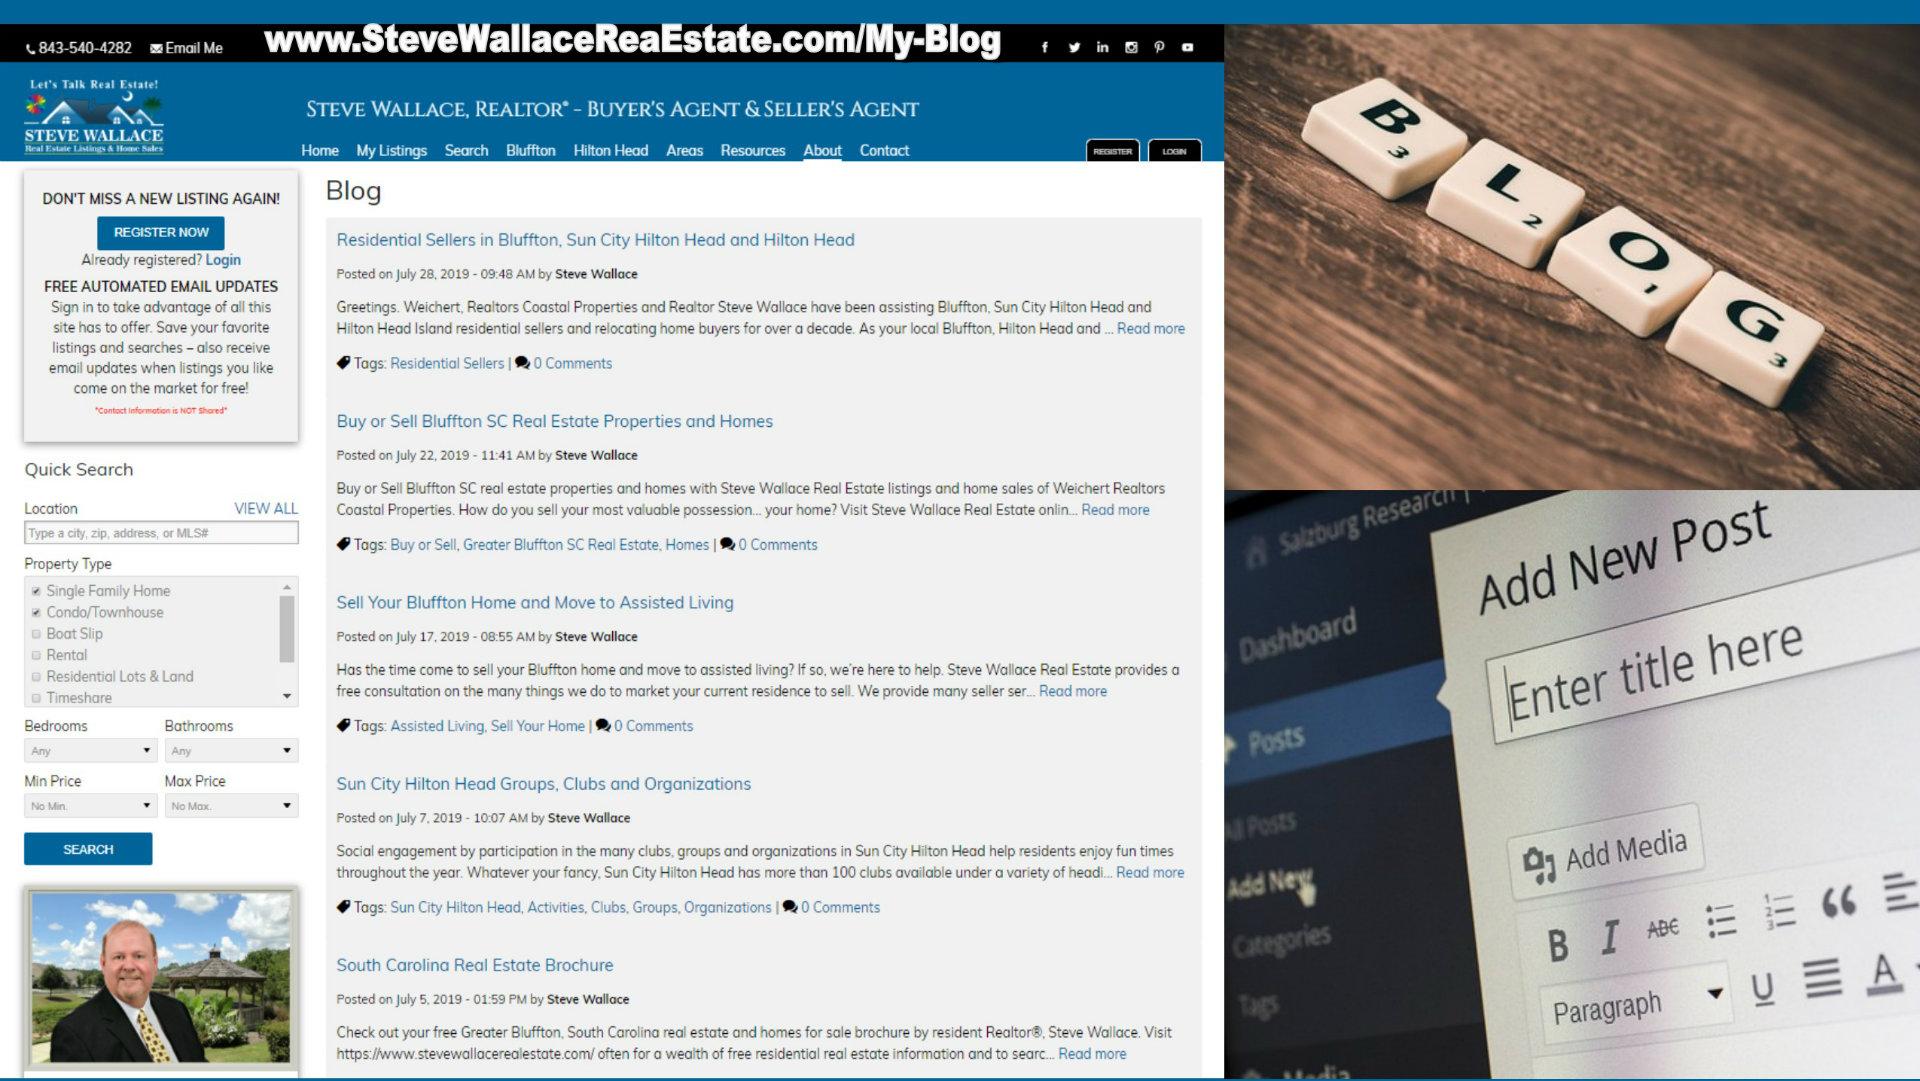 steve wallace, real estate, blogger, blogging, blog, homes, bluffton, sc, sun city, hilton head